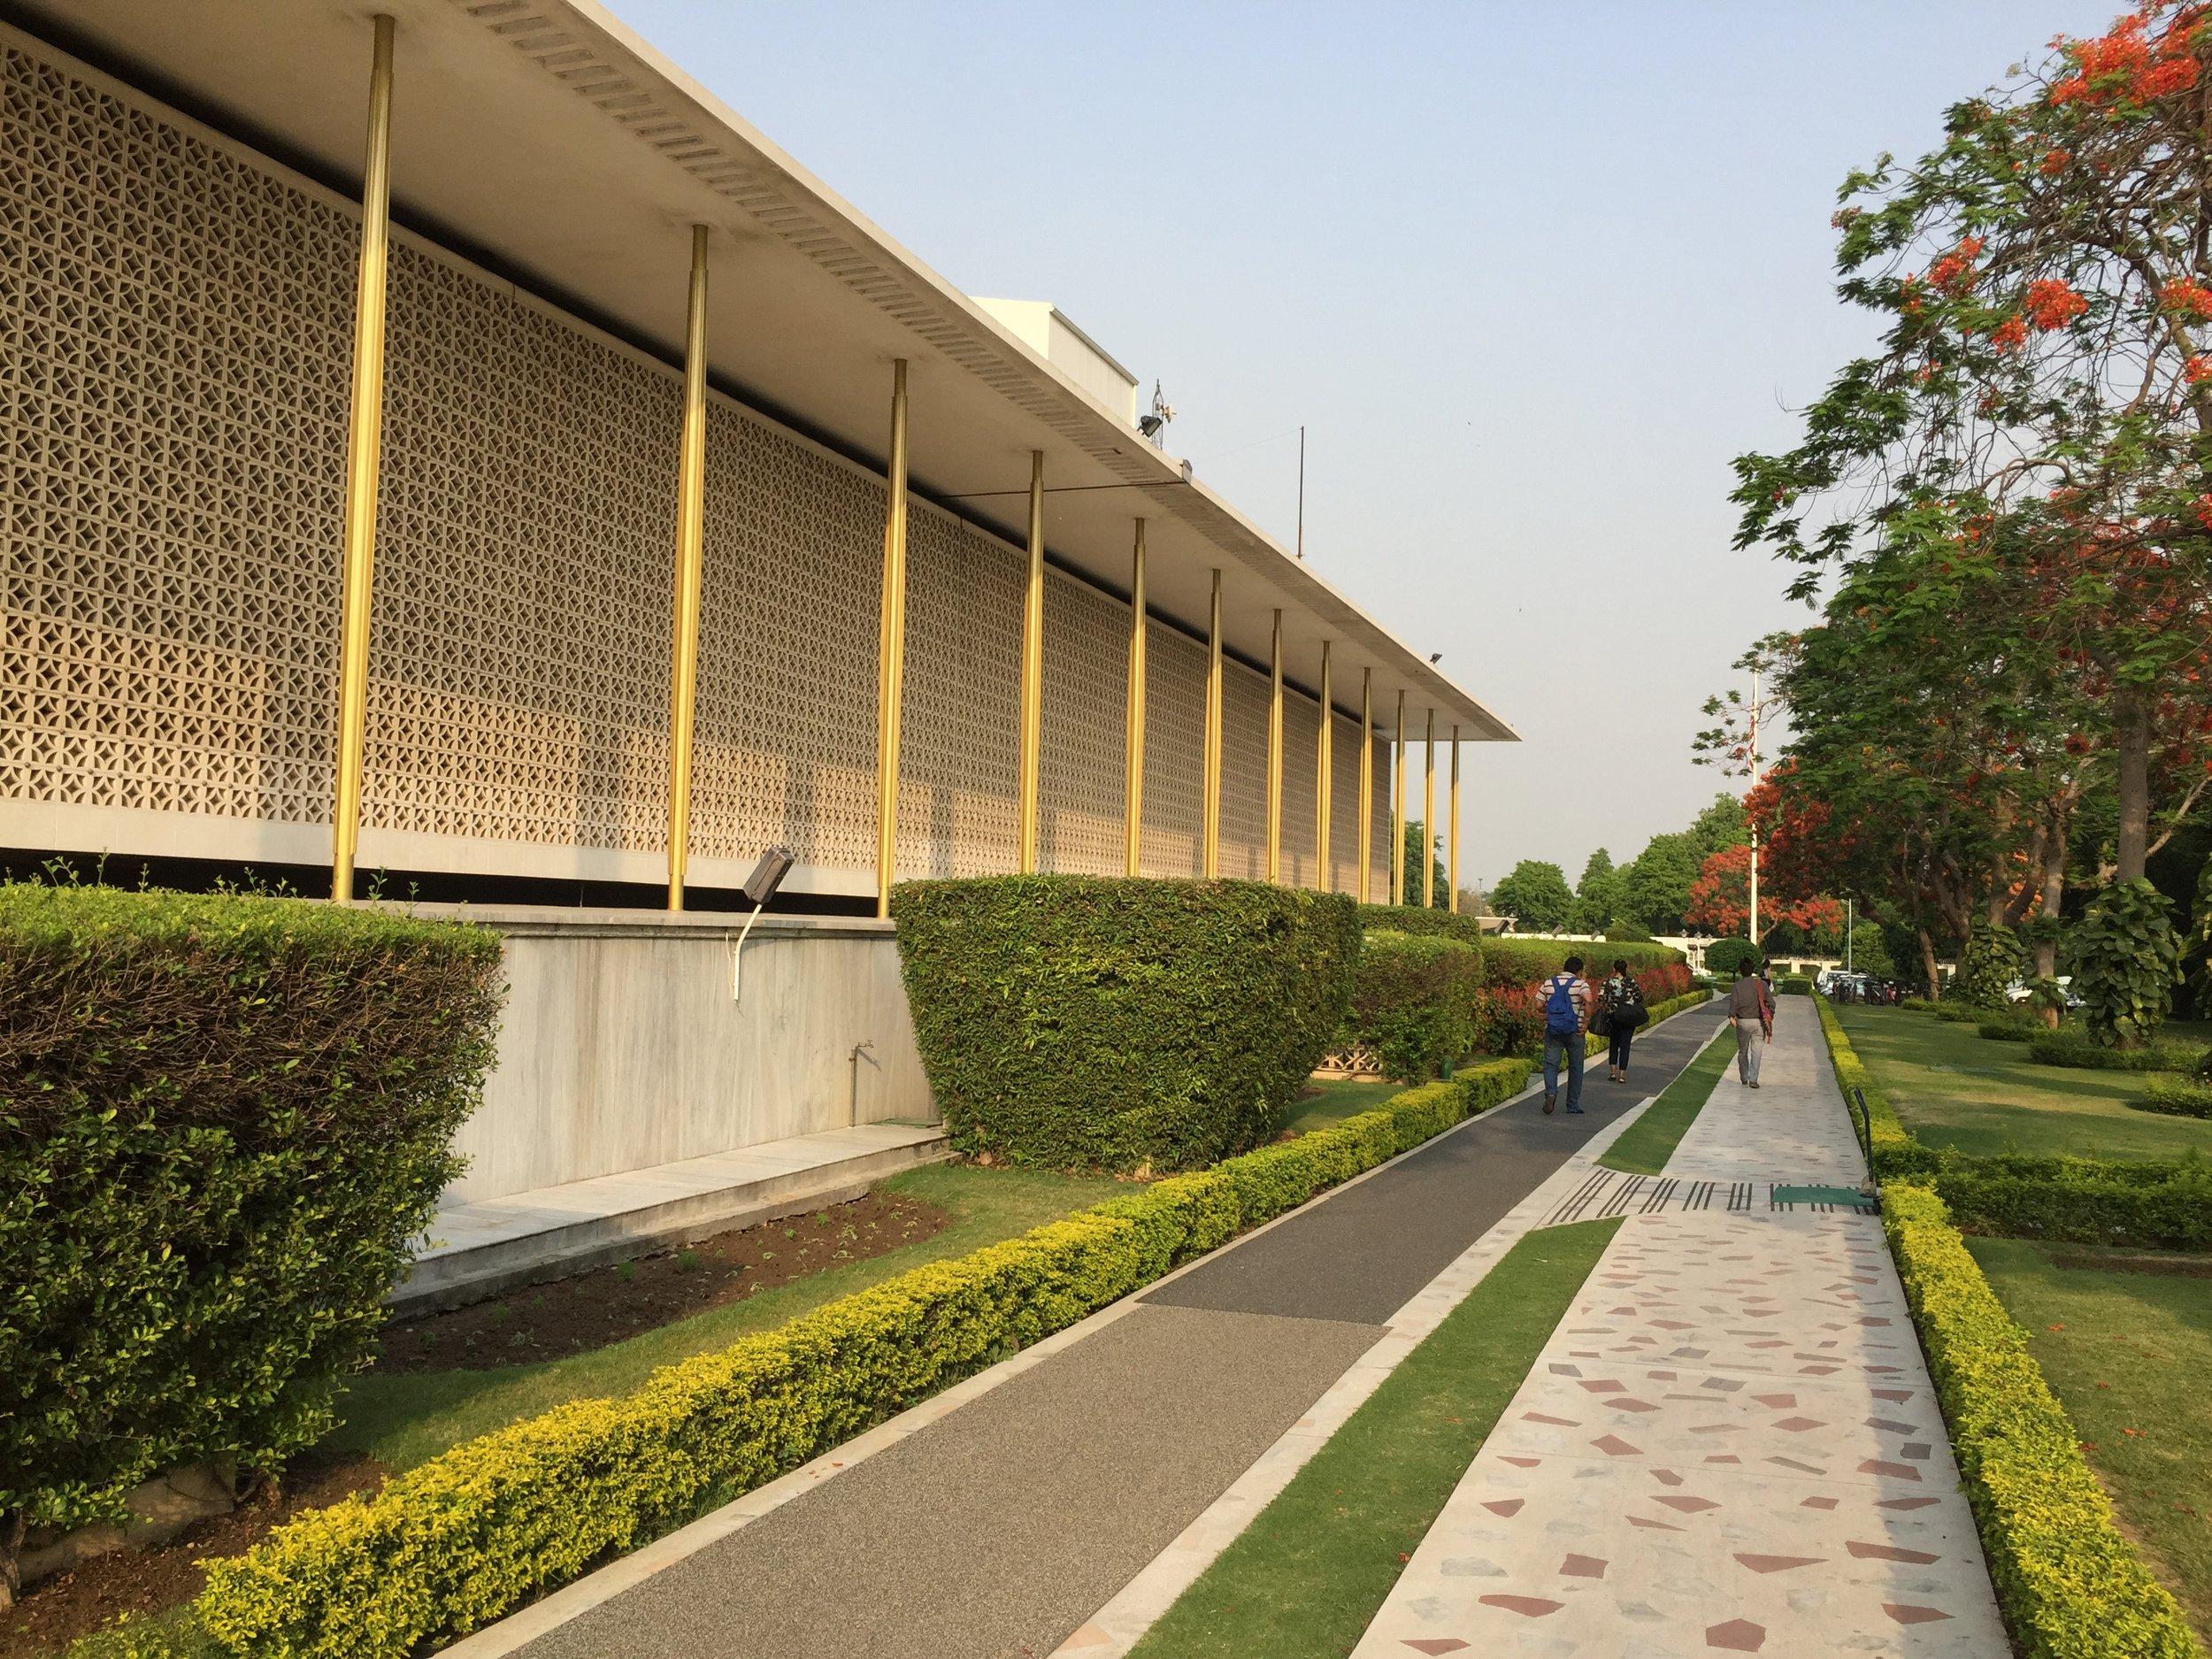 U.S. Embassy Delhi